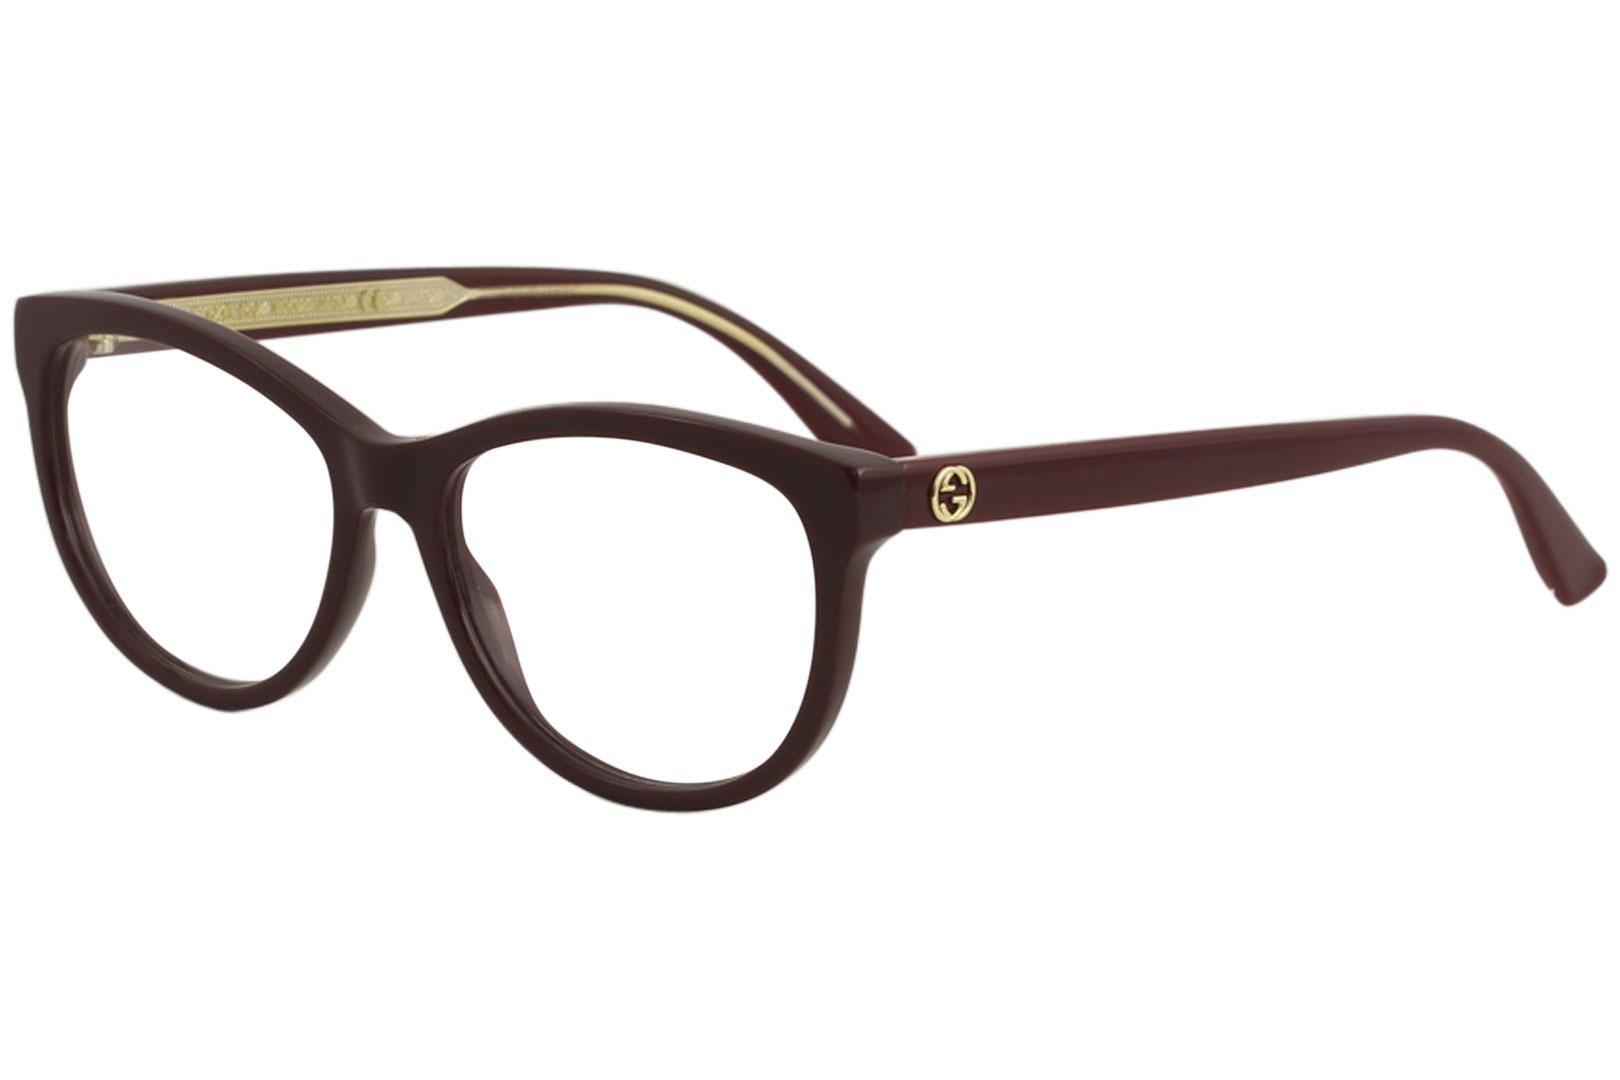 Gucci Women\u0027s Eyeglasses GG0310O GG/0310/O Full Rim Optical Frame